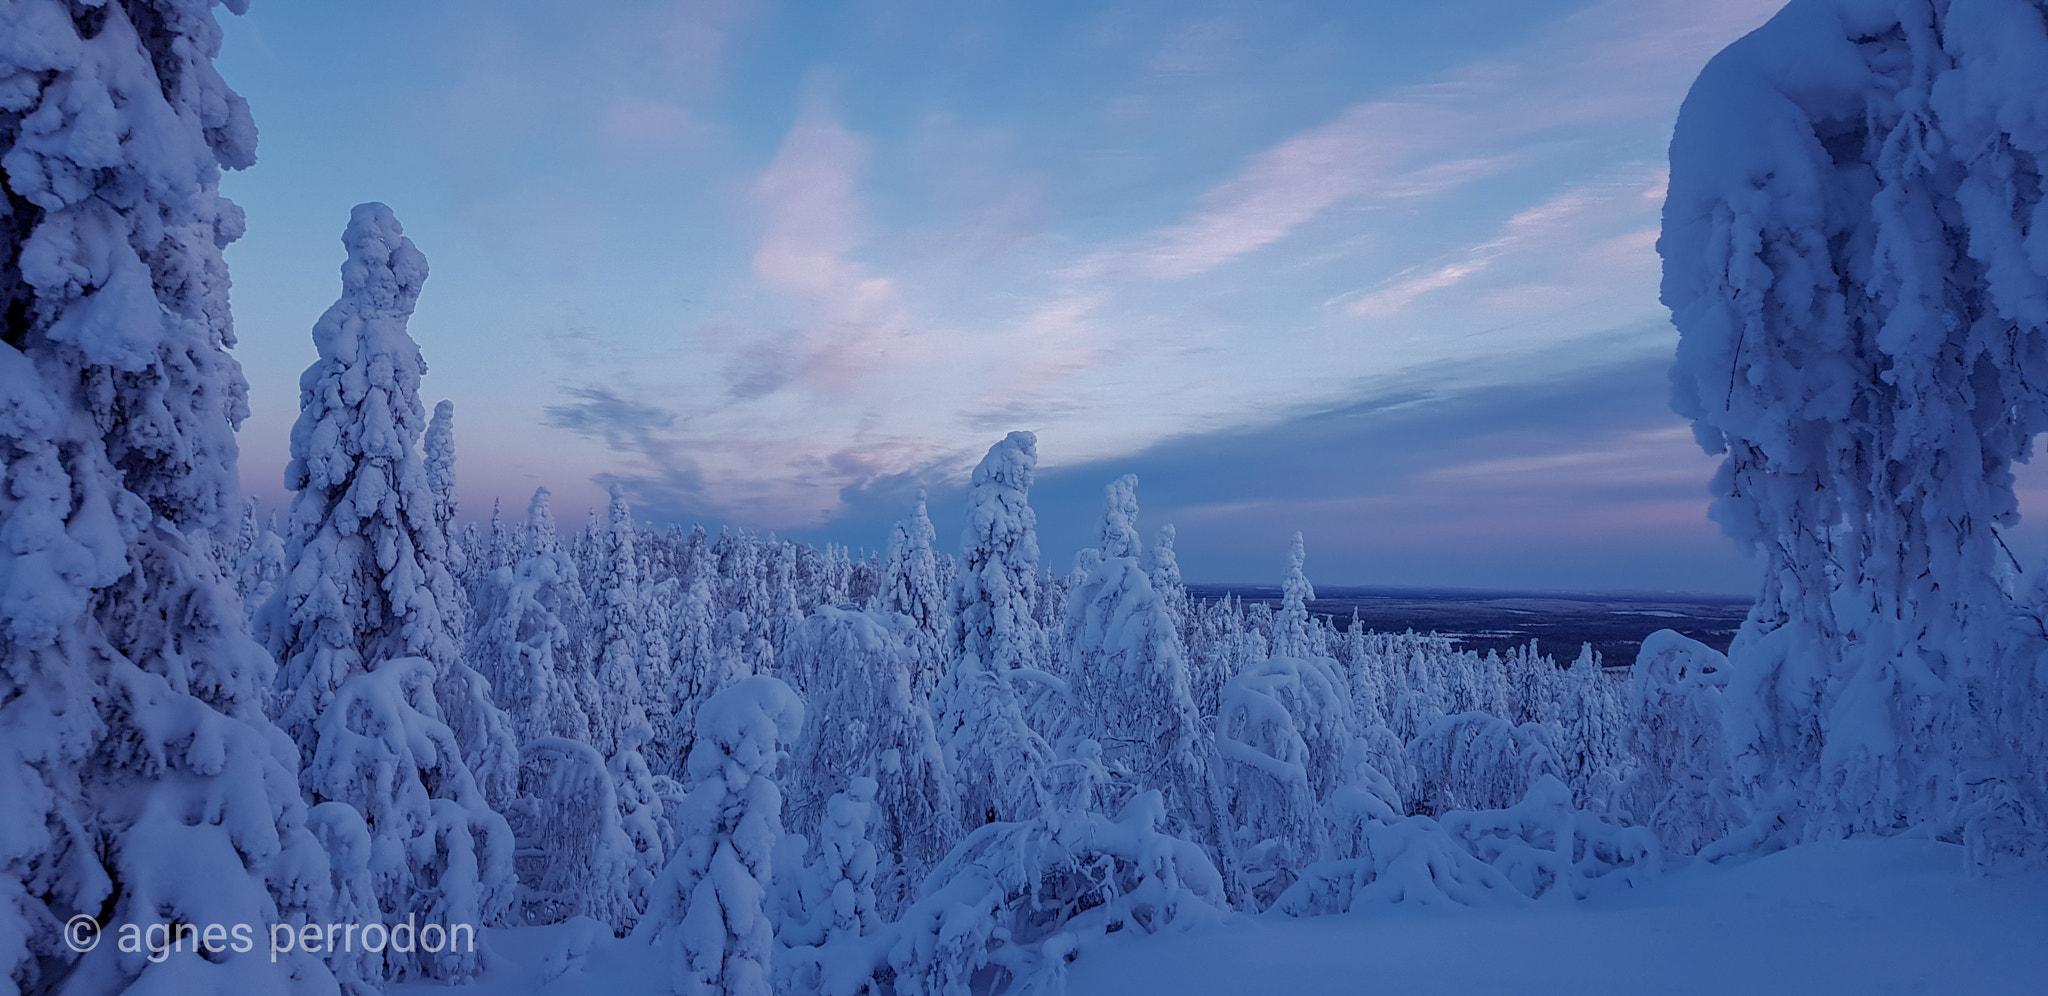 Зимняя природа в Финляндии, by Agnеs Perrodon